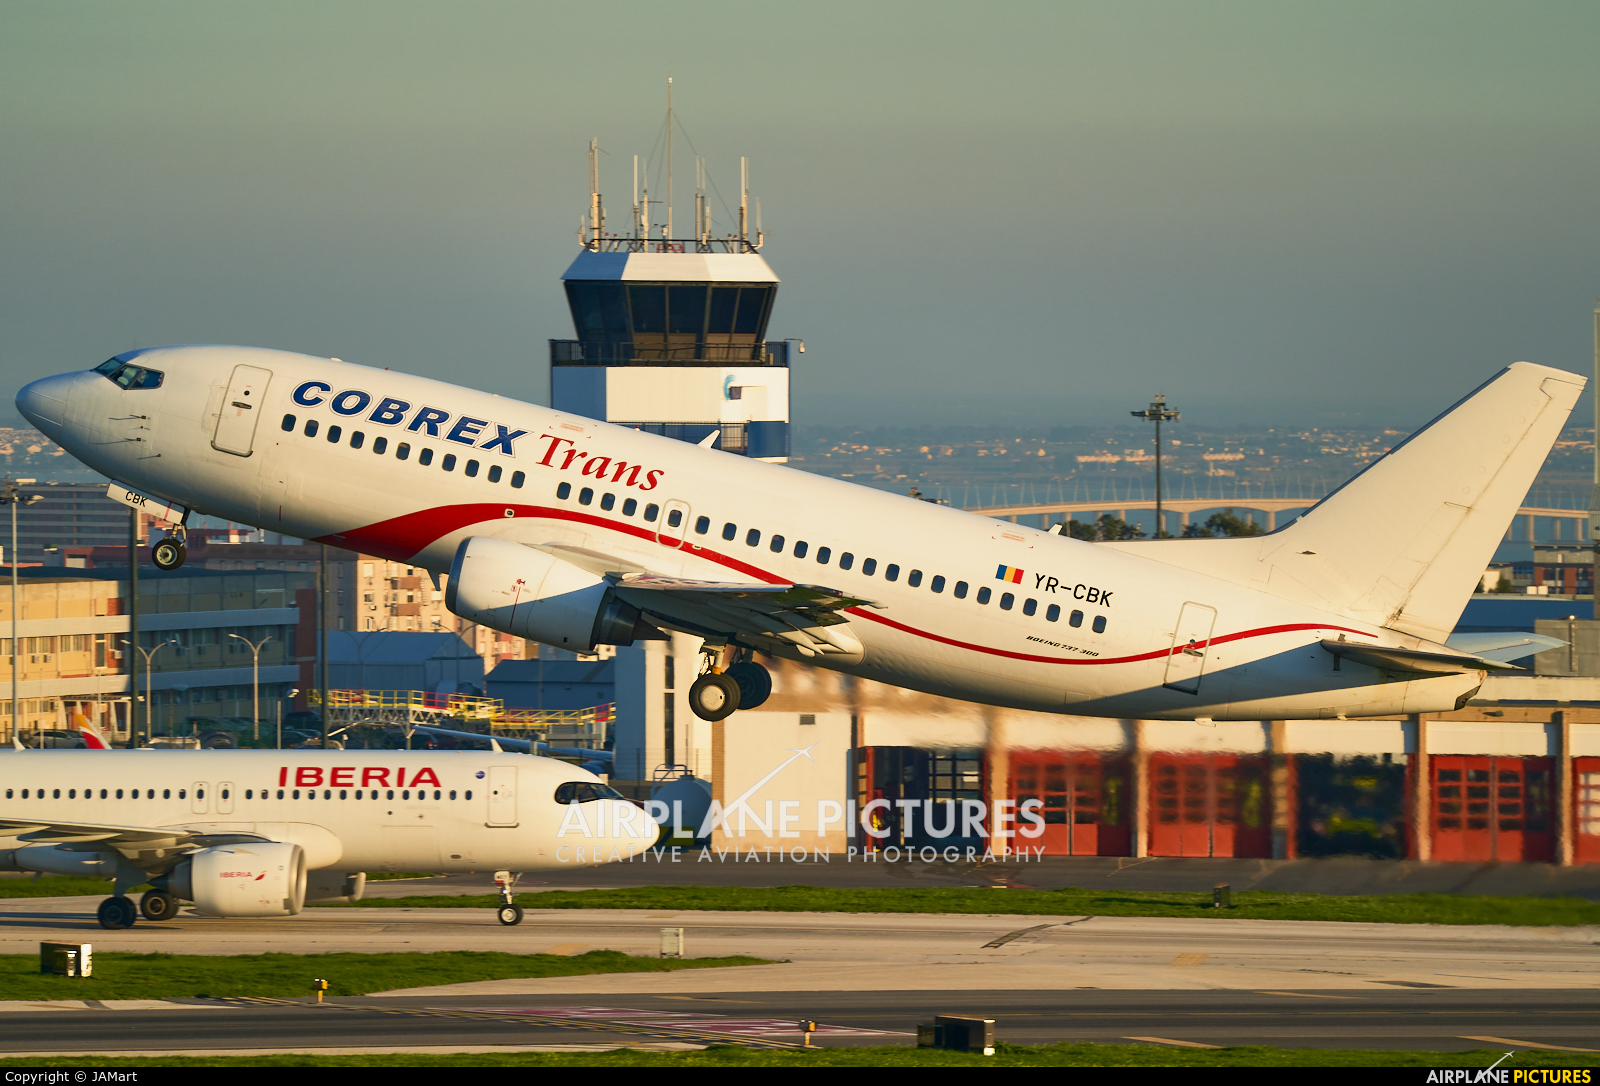 Cobrex Trans YR-CBK aircraft at Lisbon